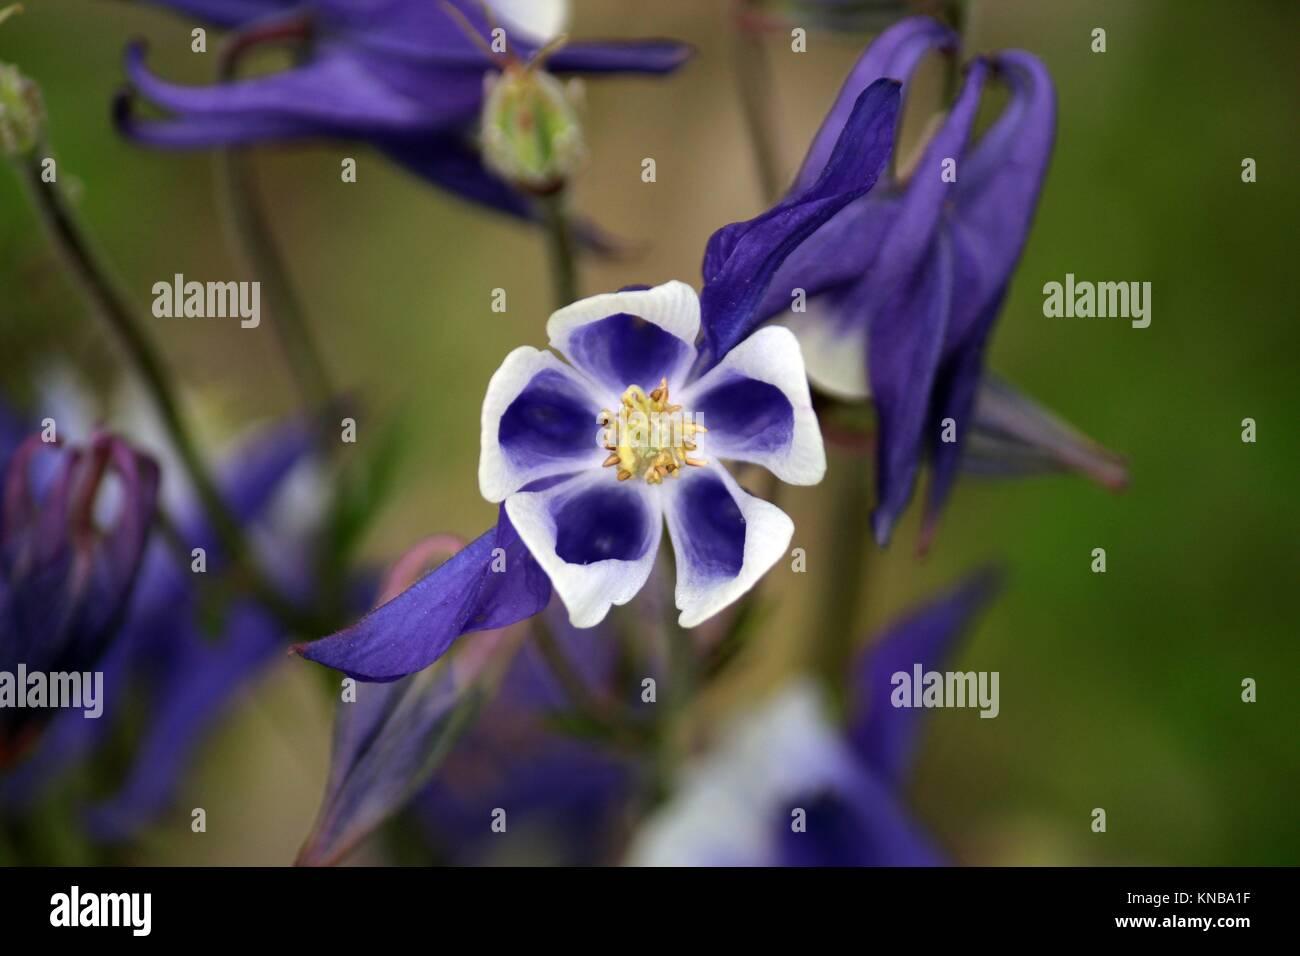 Closeup of a purple Columbine in full bloom using a bokeh effect